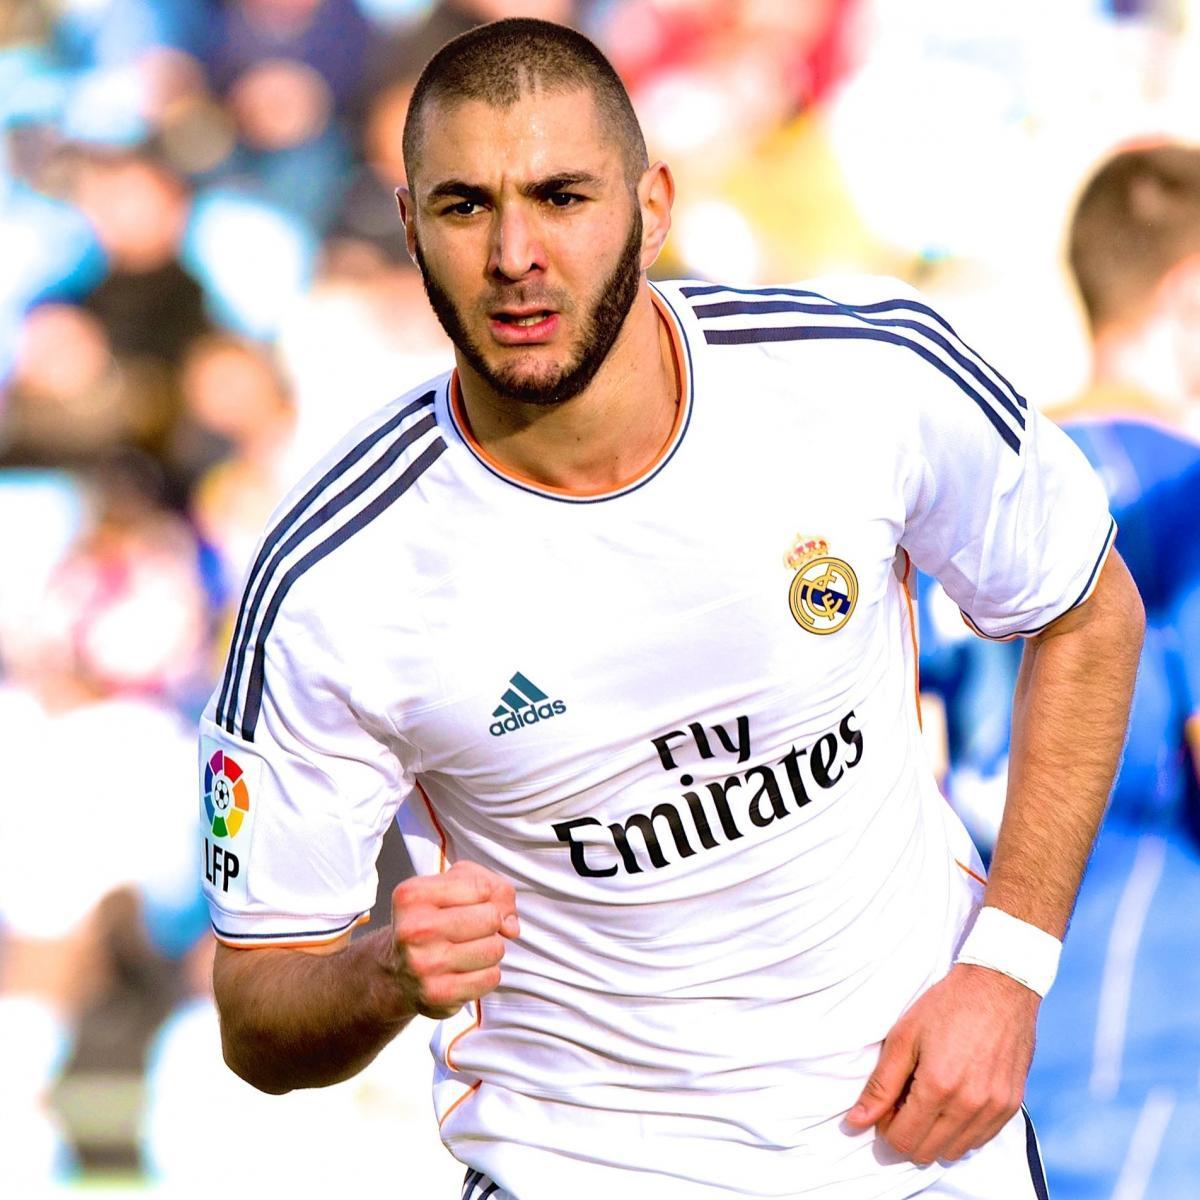 Javier Hernandez Real Madrid: Why Karim Benzema Is Better Striker Option Than Javier